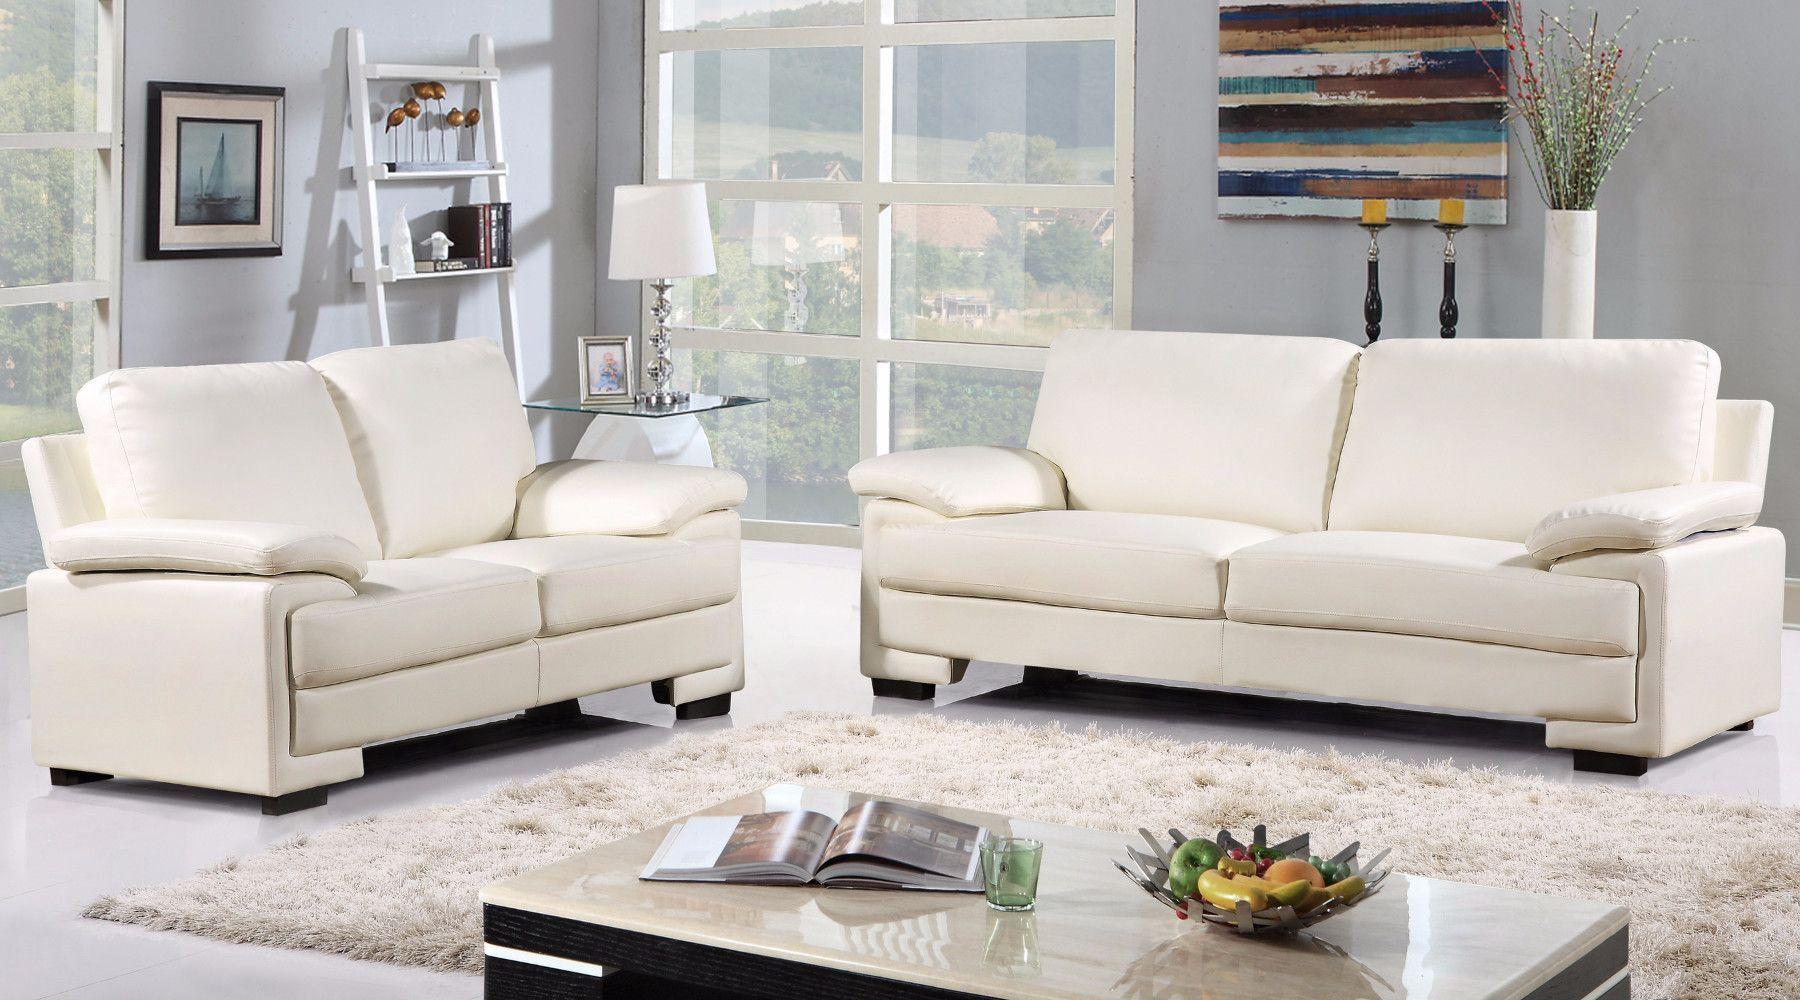 itm living loveseat ims celio furniture ebay room wood couch trim set hm sofa and microfiber brown